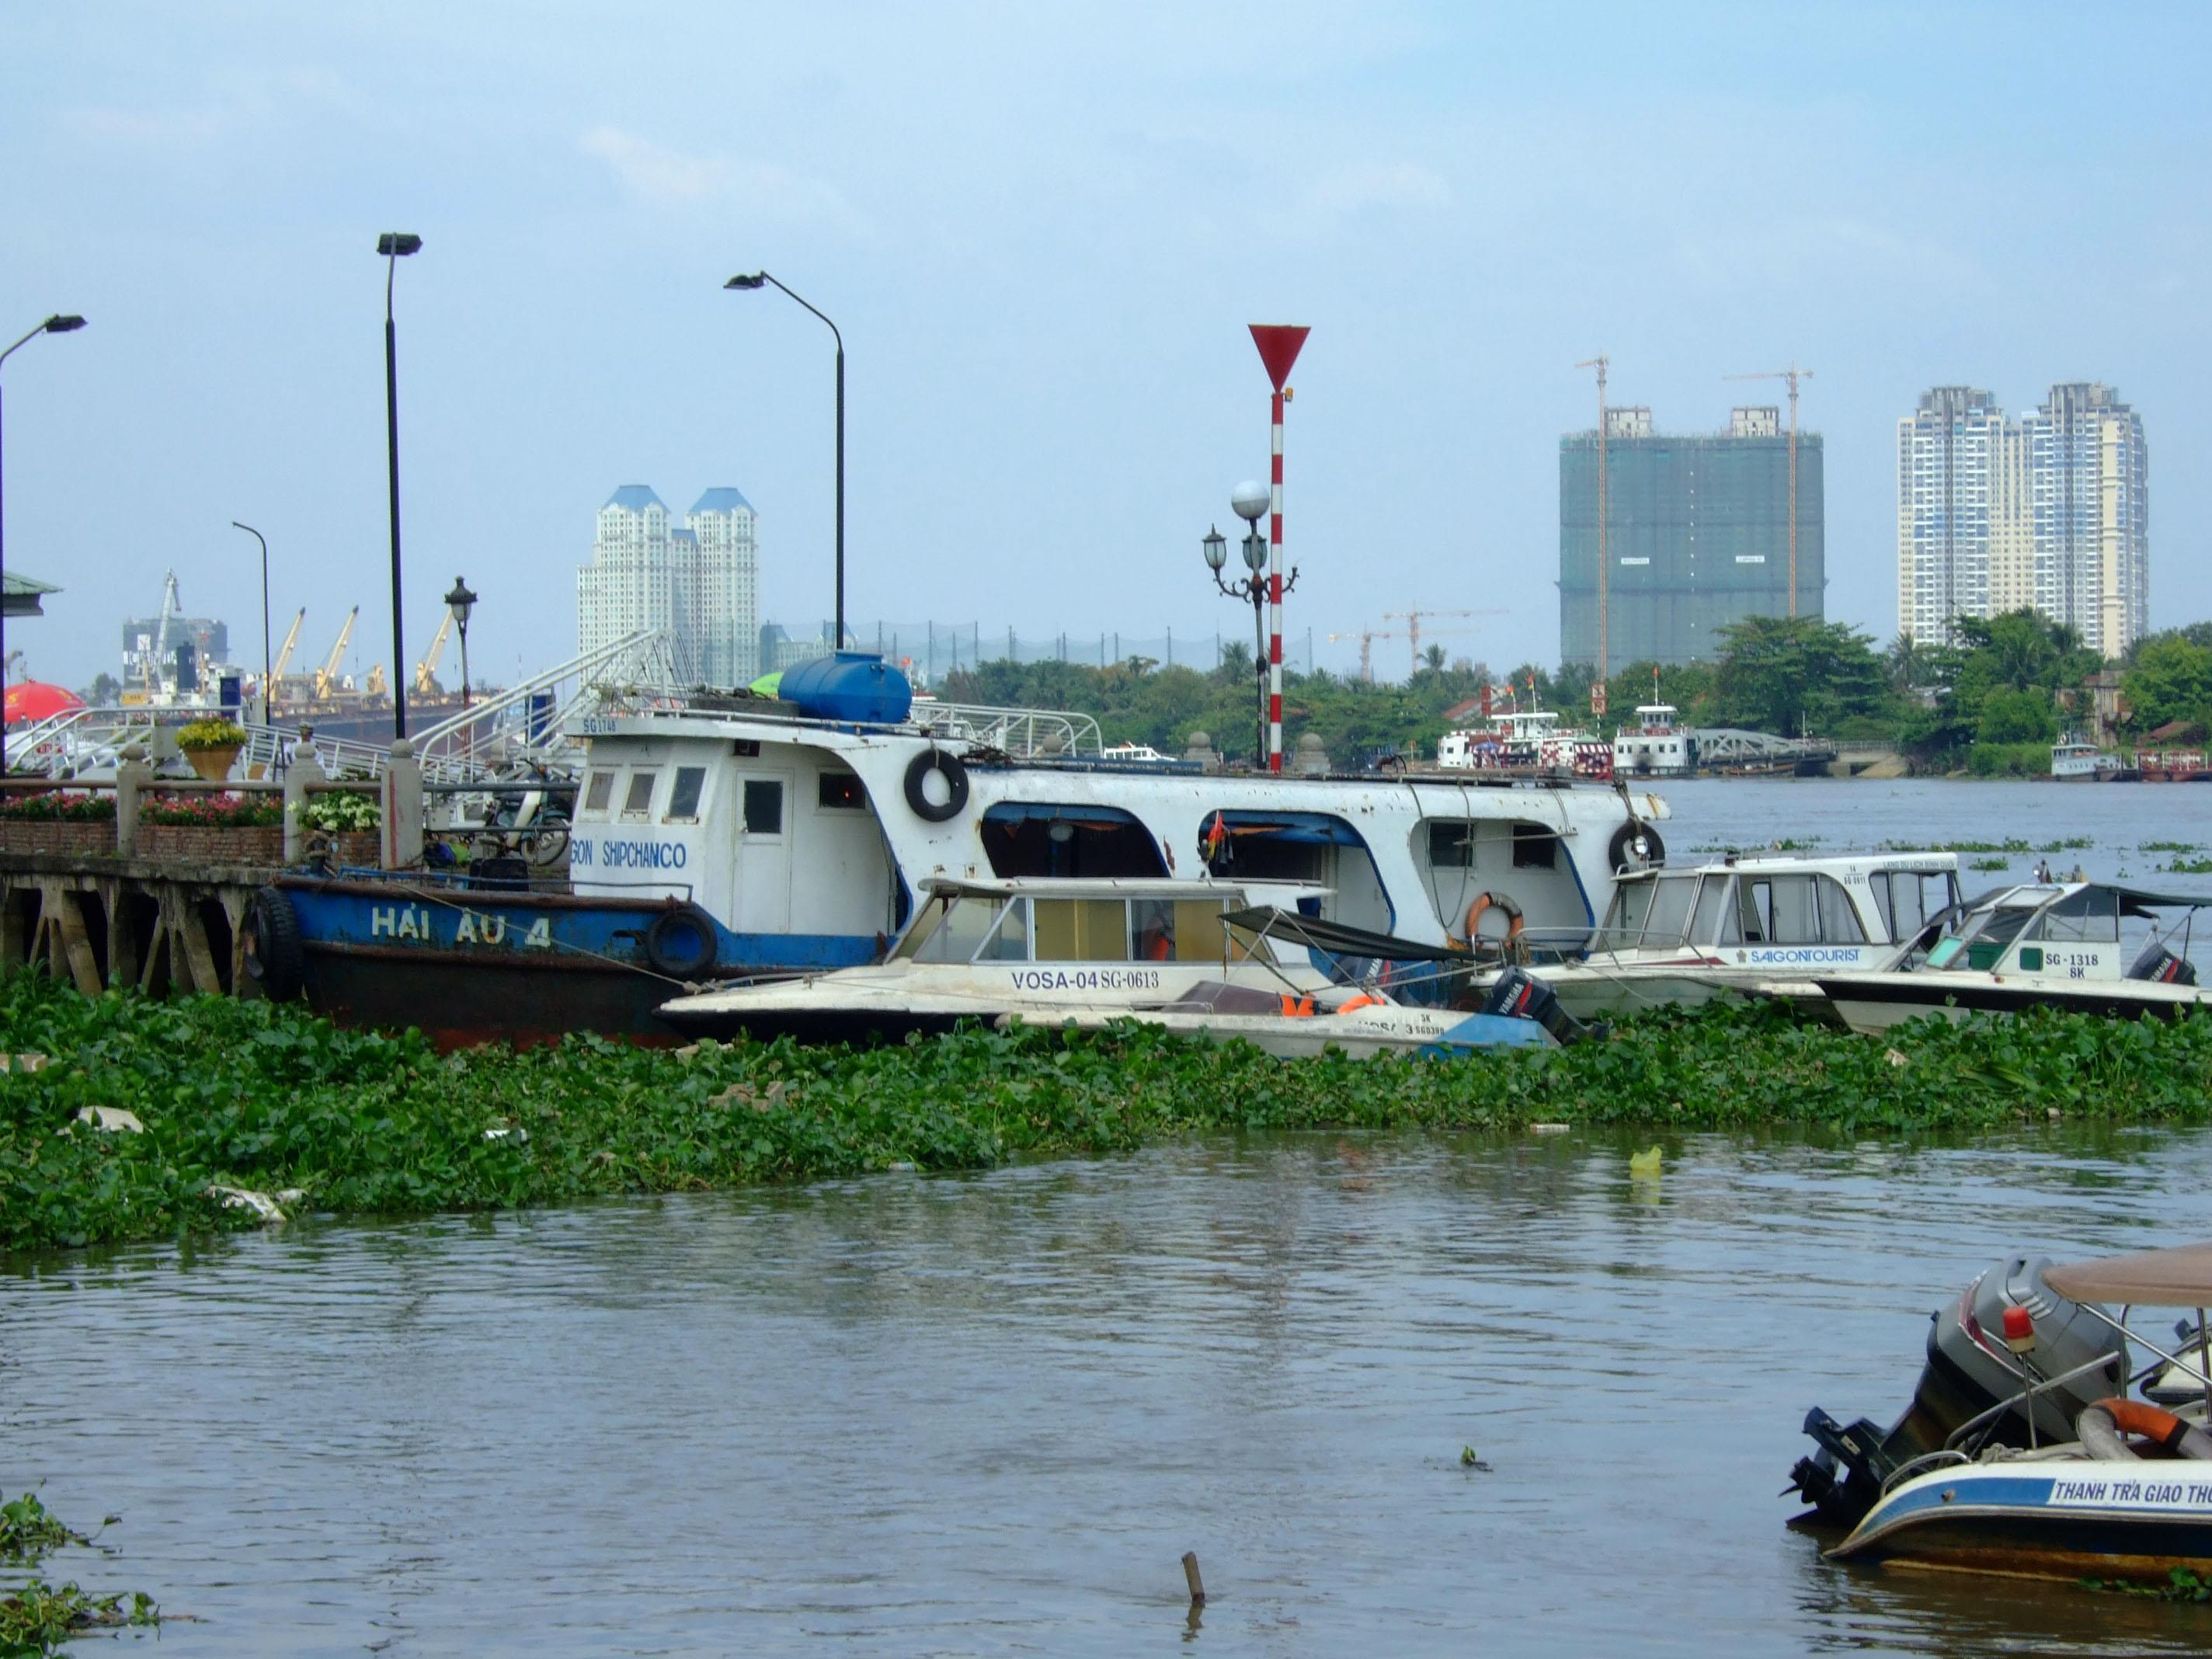 Vietnam Ho Chi Minh City Saigon harbor Ferries boats Feb 2009 27